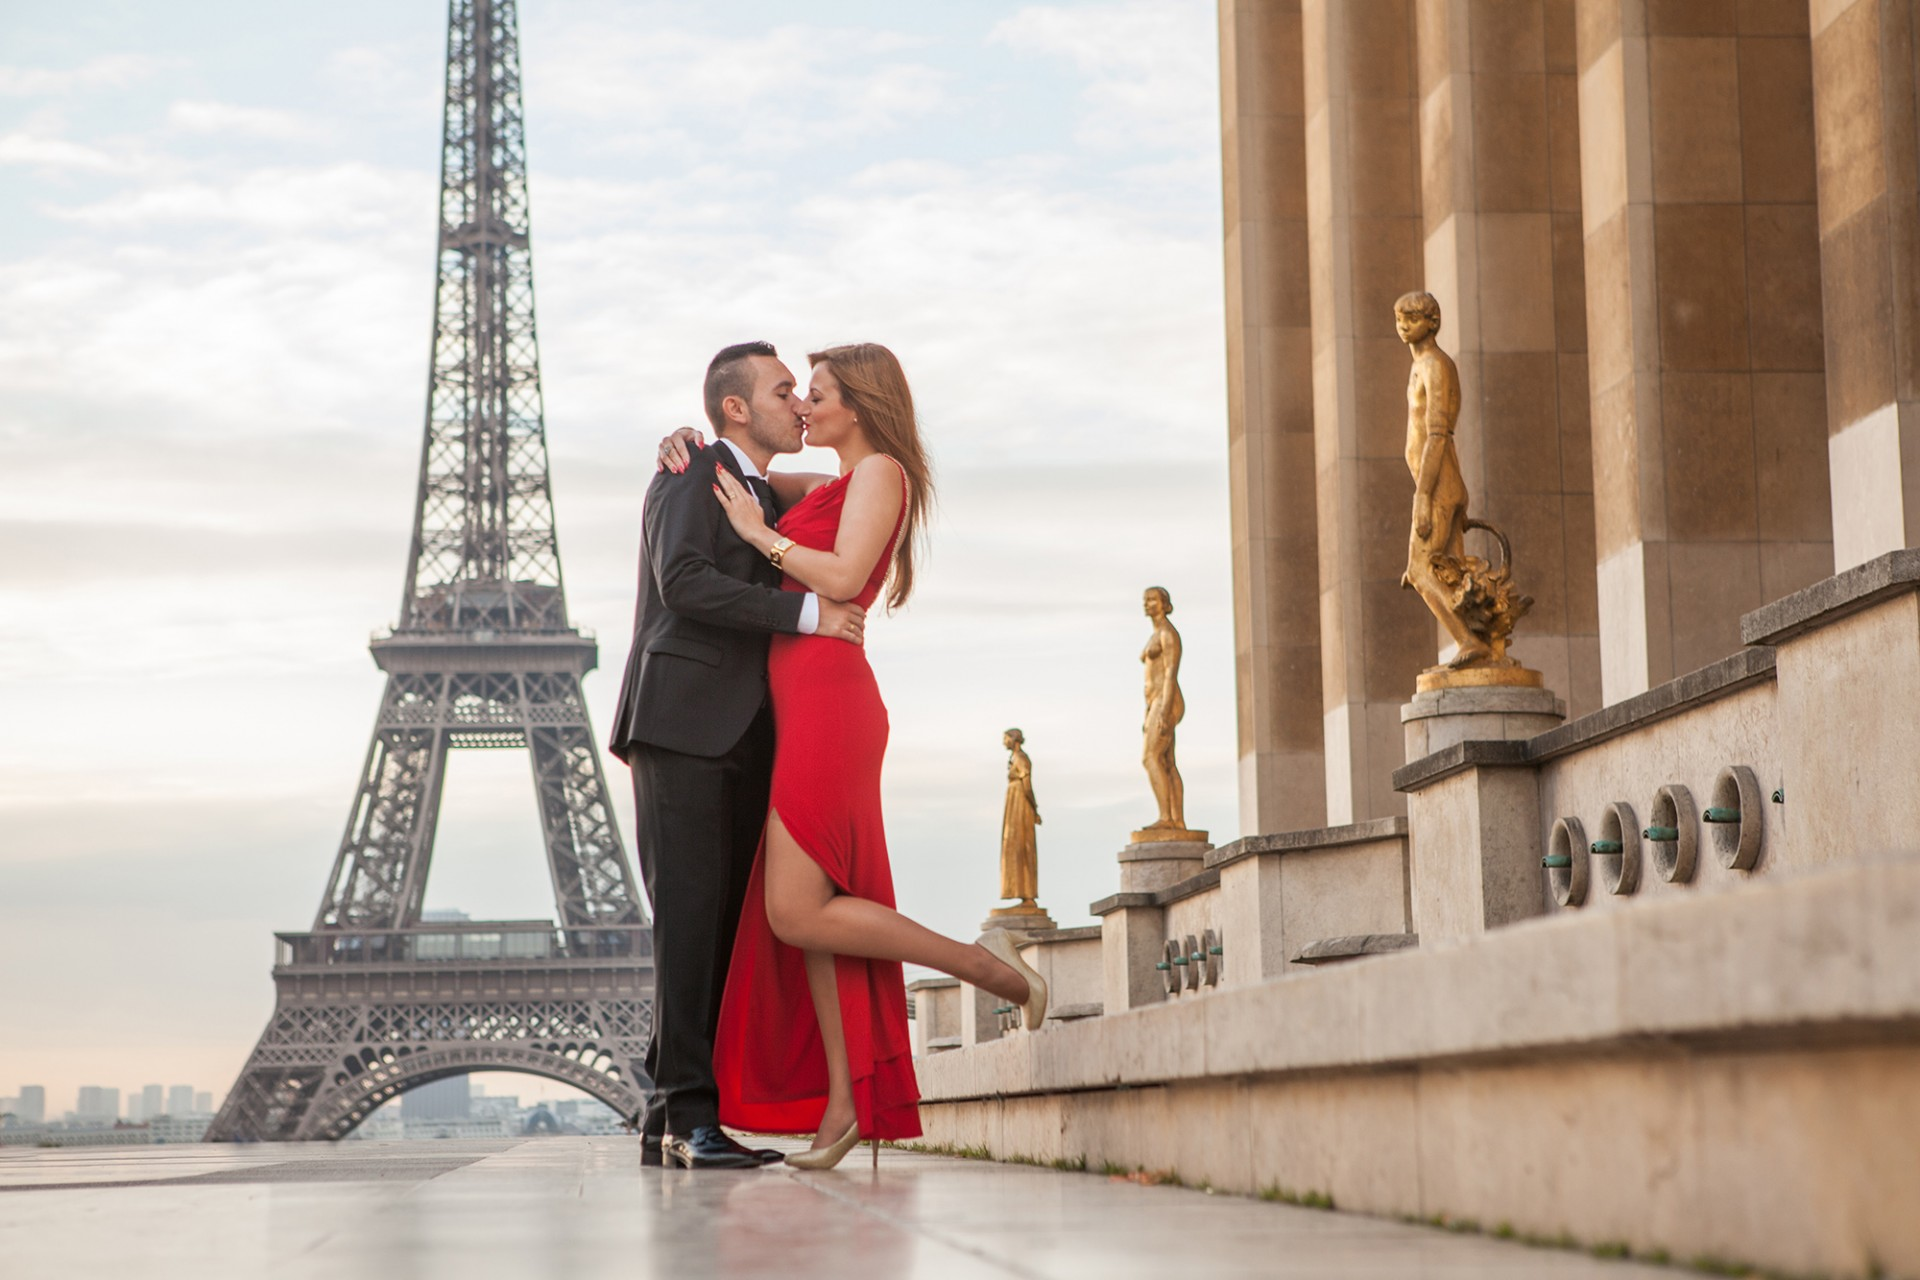 Romantischer Fotograf Paris beim Paar Fotoshooting